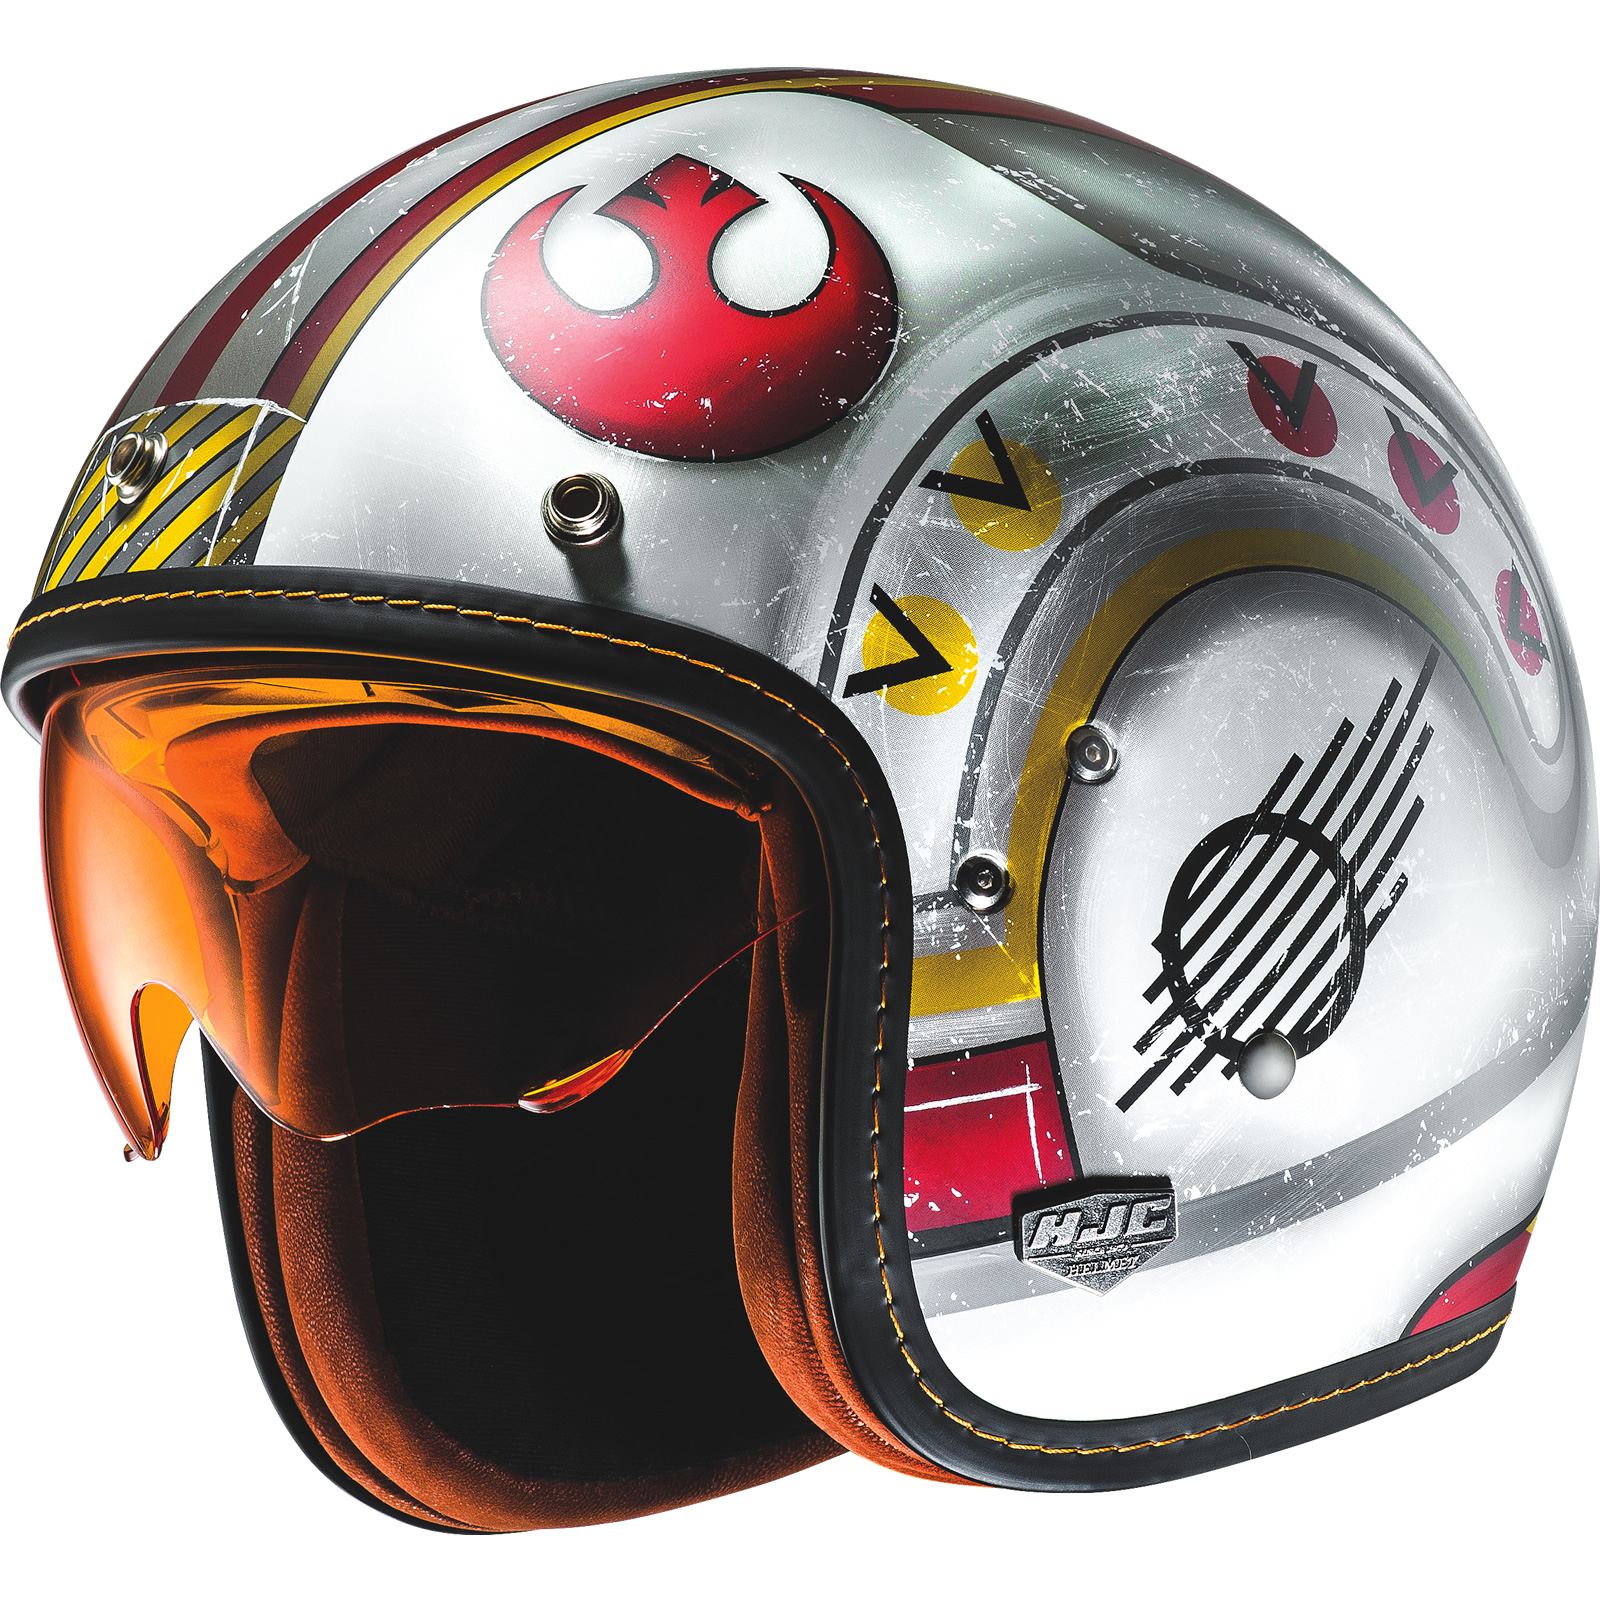 Fighter Pilot Motorcycle Helmet HJC FG-70S X-Wi...